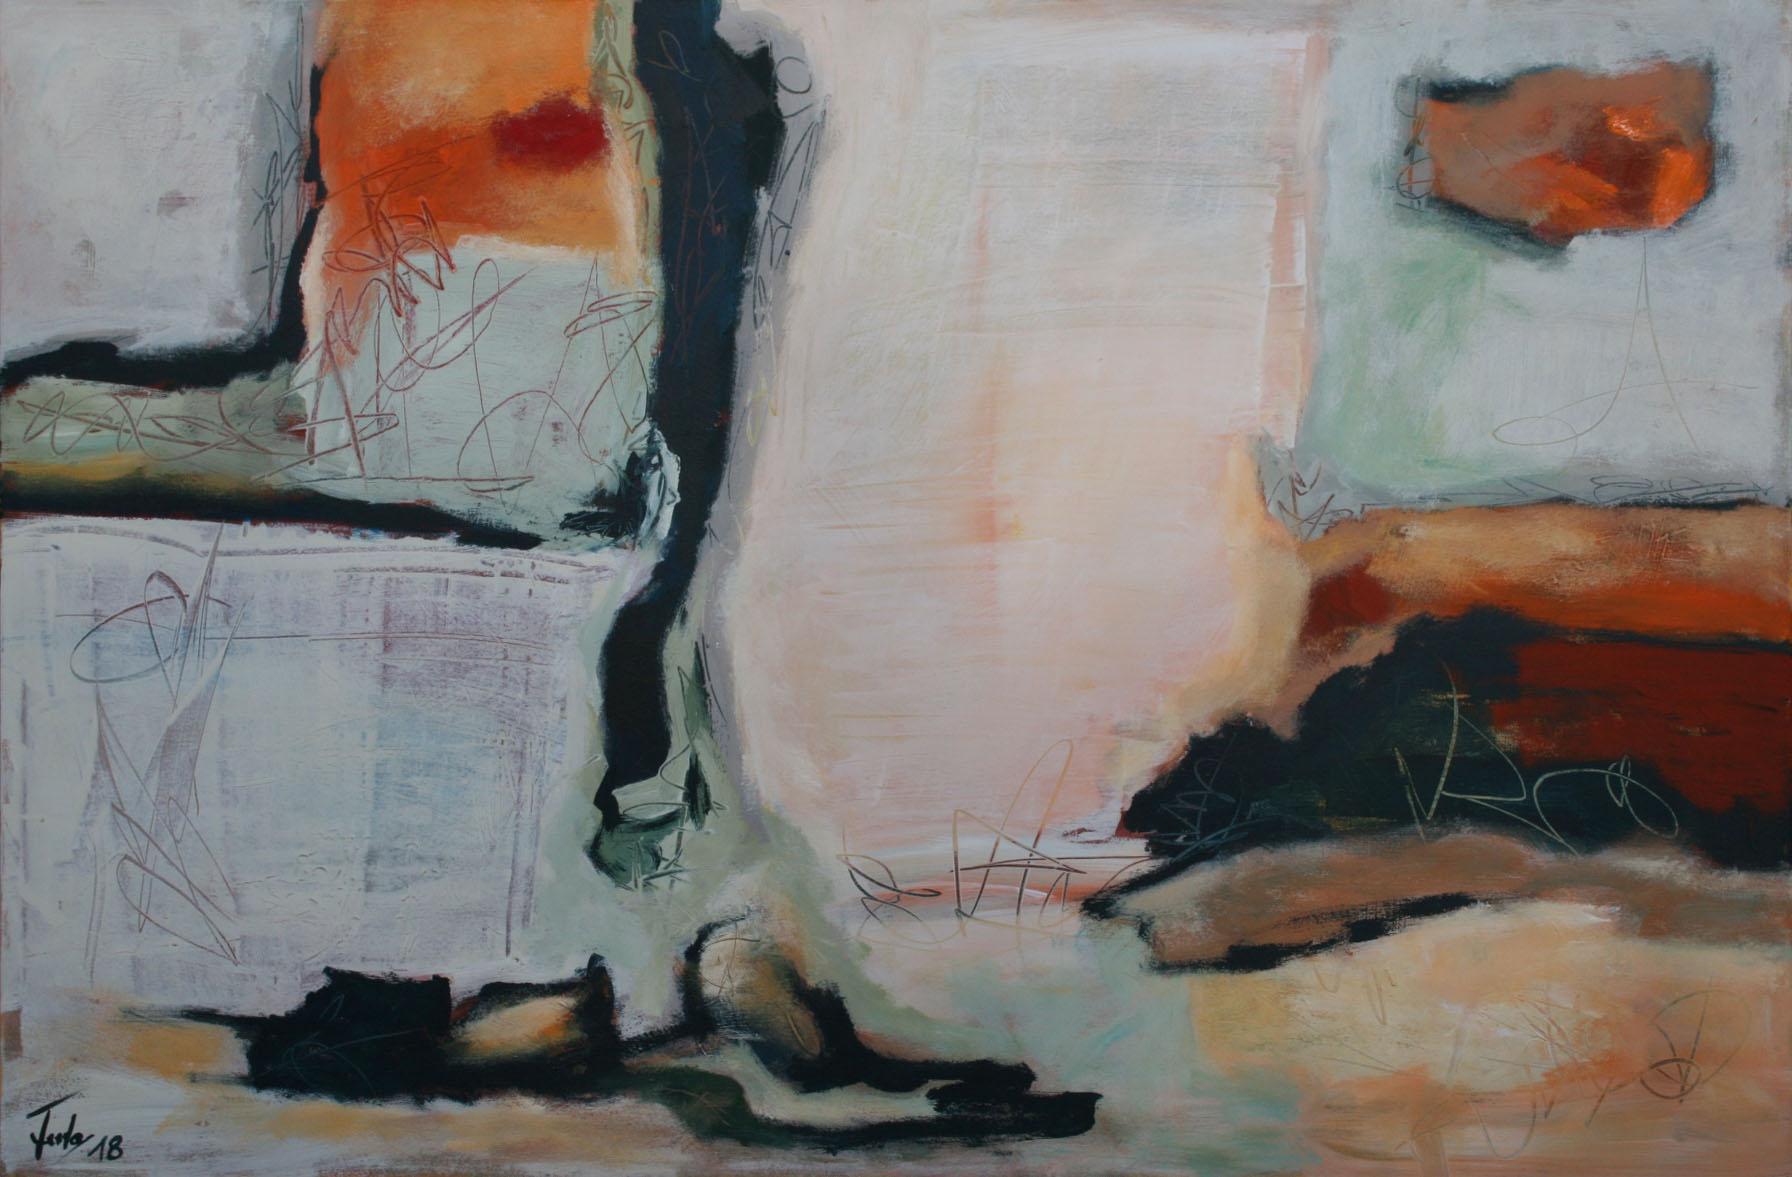 Ohne Titel 1801, Öl und Acryl auf Leinwand, 80 x 120 cm